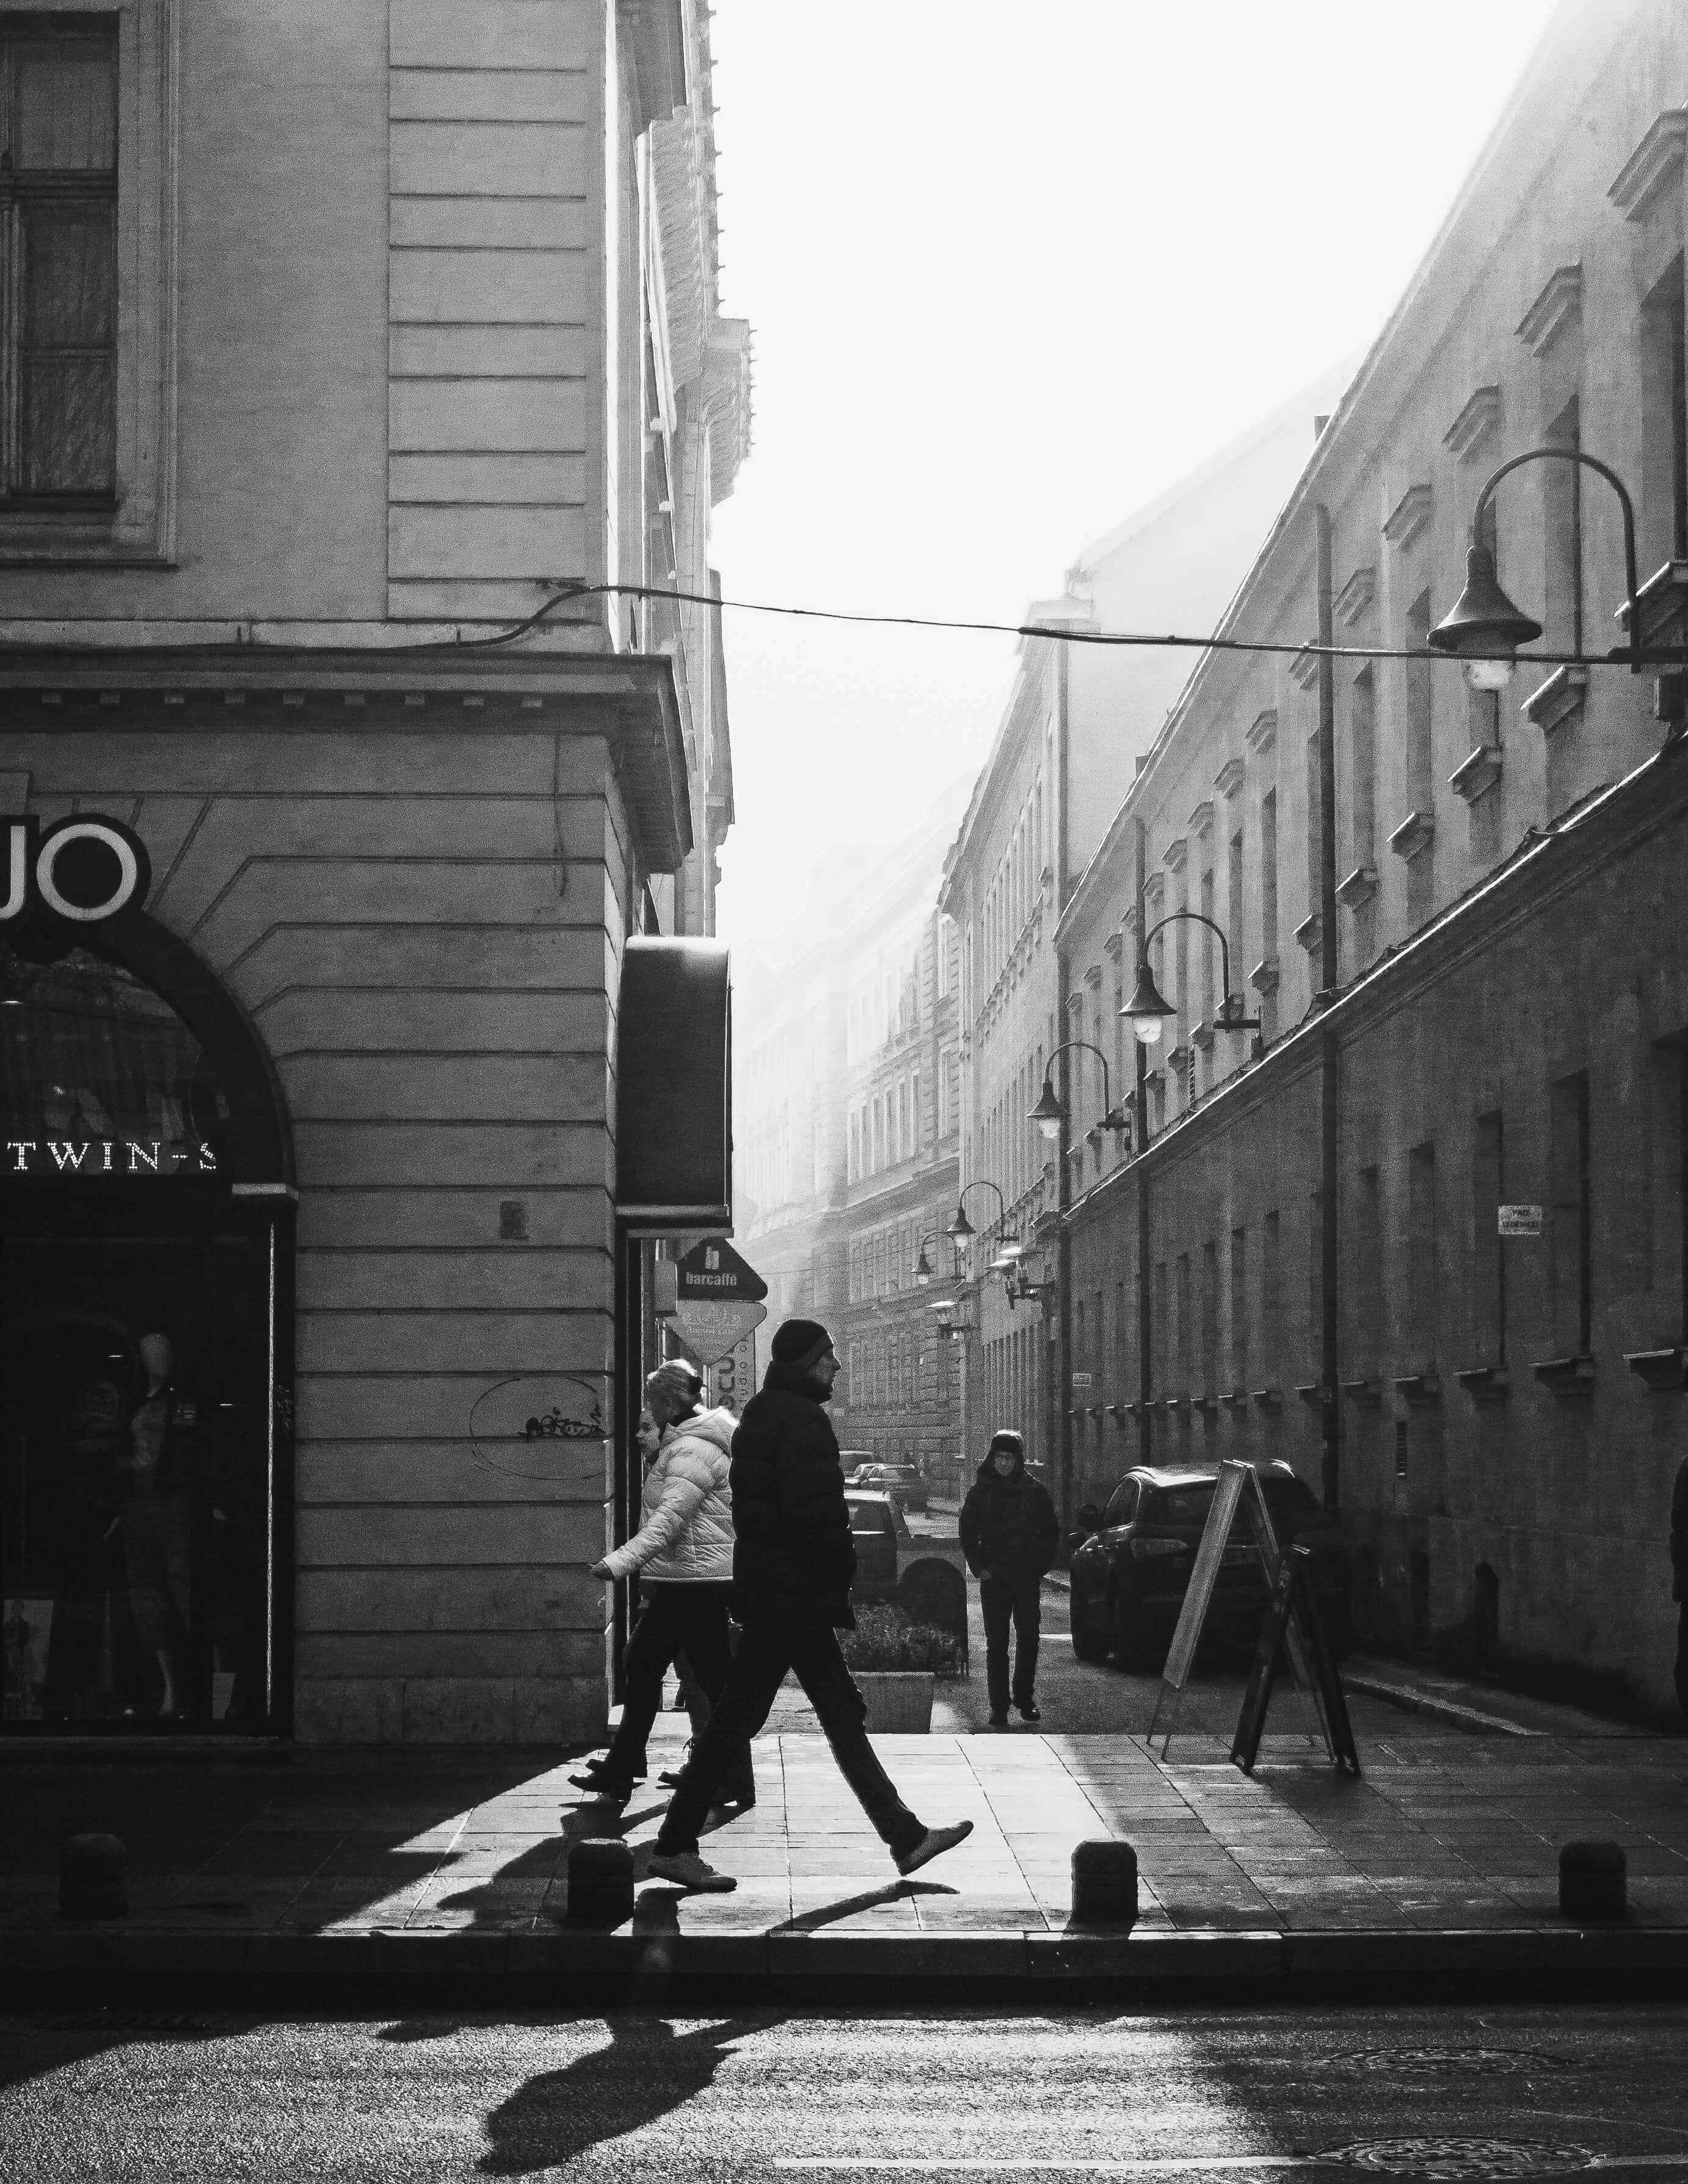 Grayscale Photo of People Walking on Sidewalk - iPhone camera burst mode